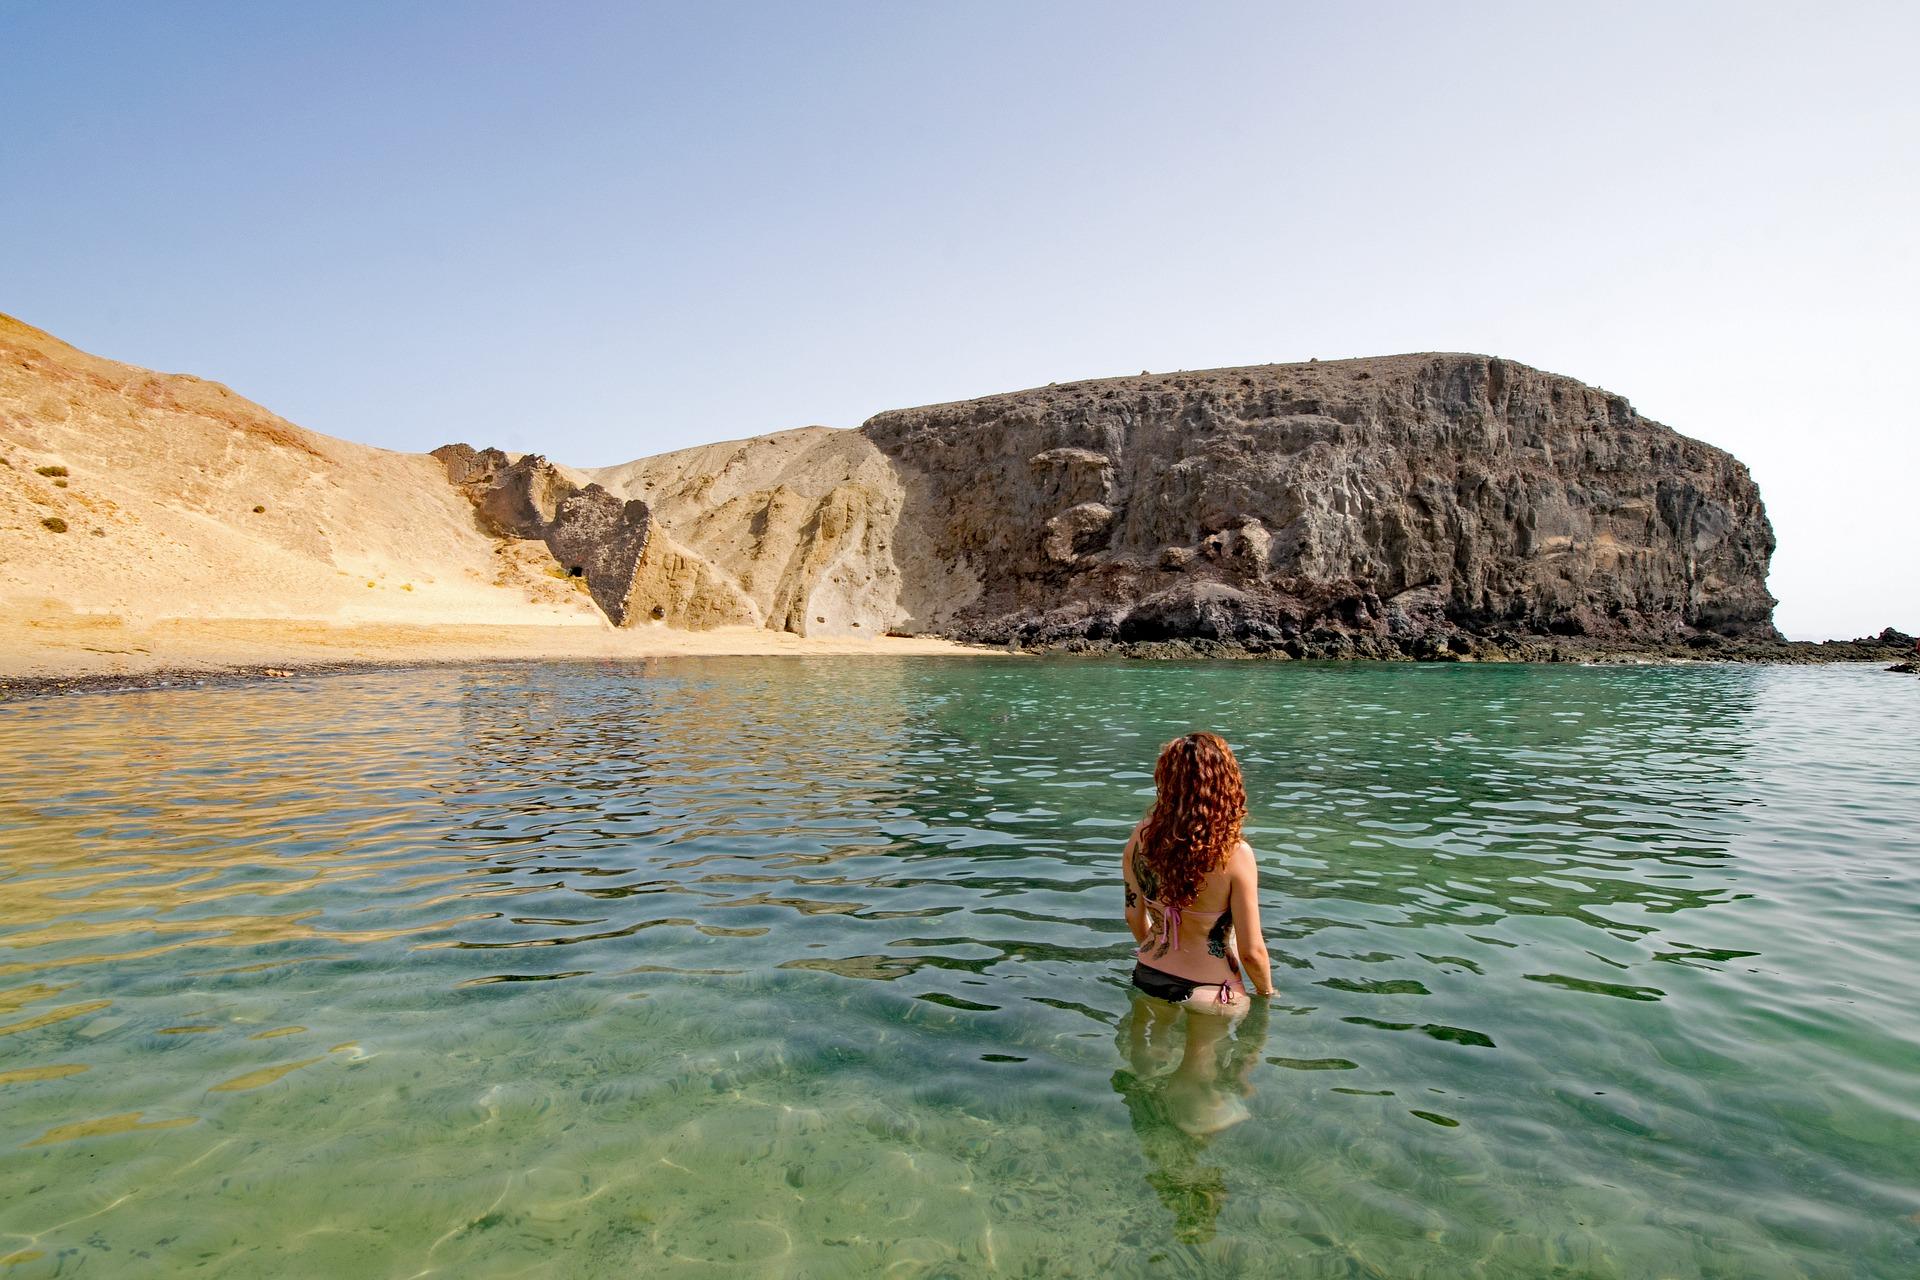 Main image of article: Lanzarote